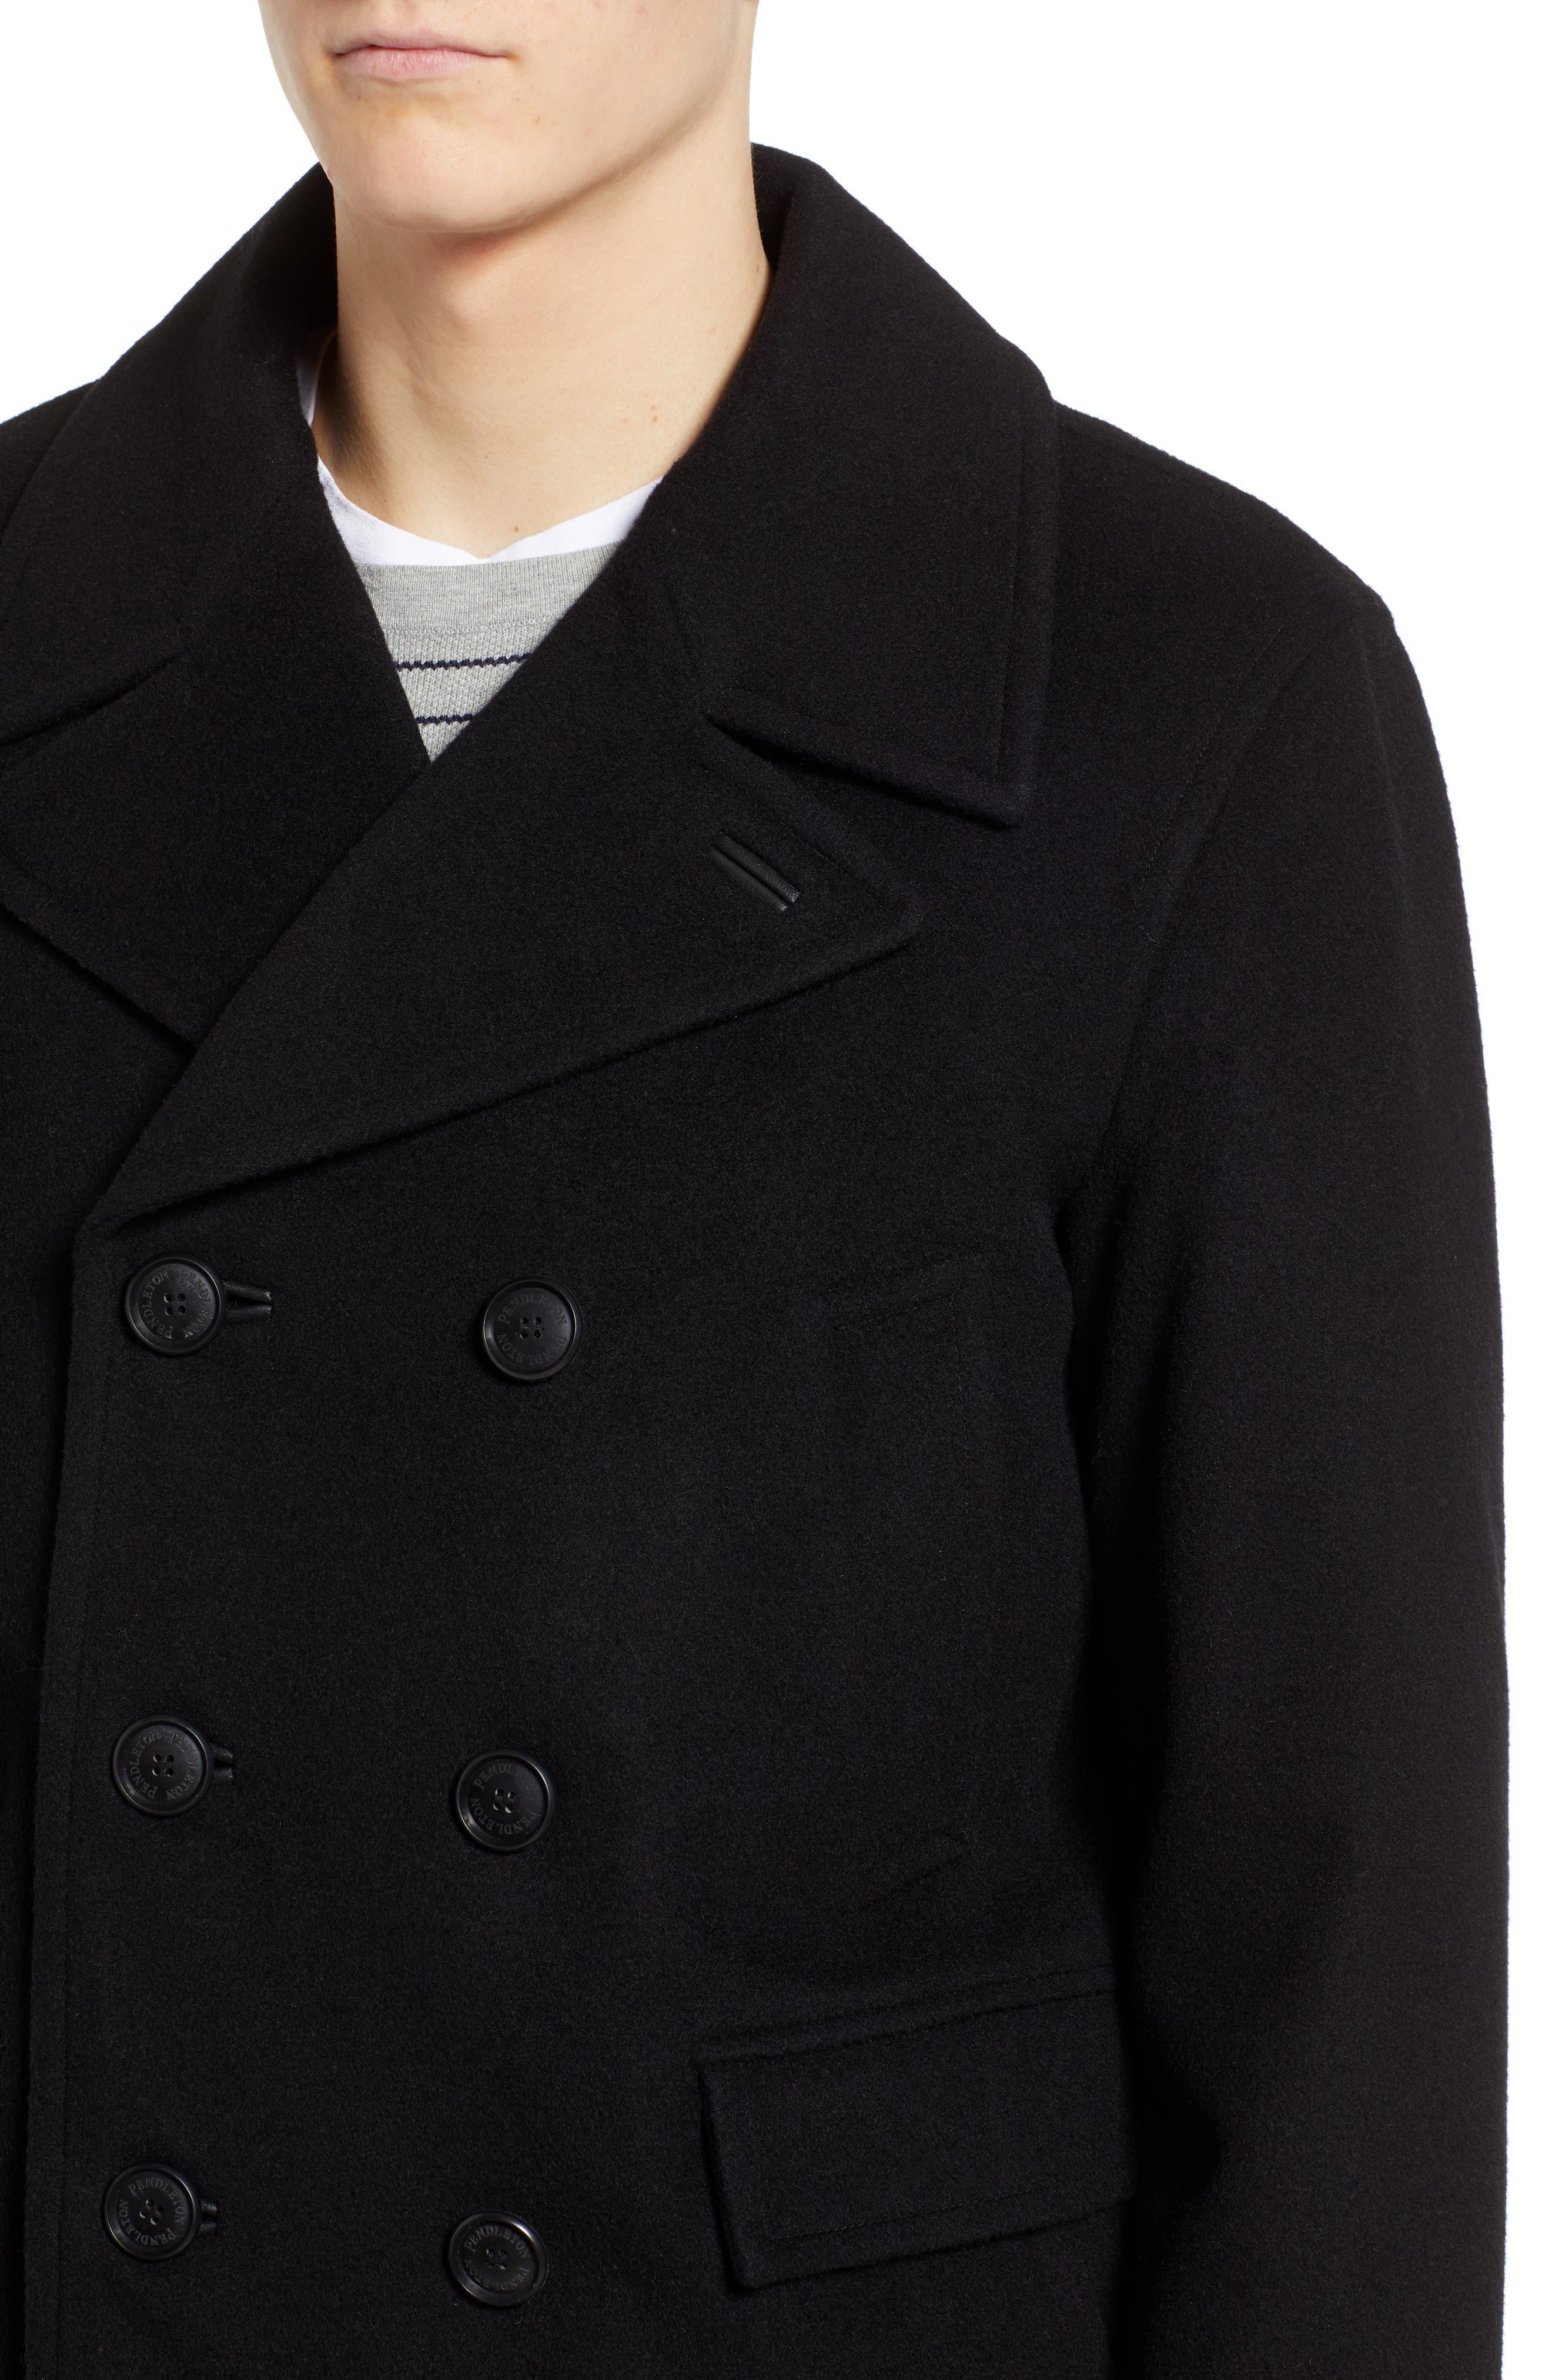 PENDLETON, Maritime Wool Blend Peacoat, Alternate thumbnail 5, color, BLACK